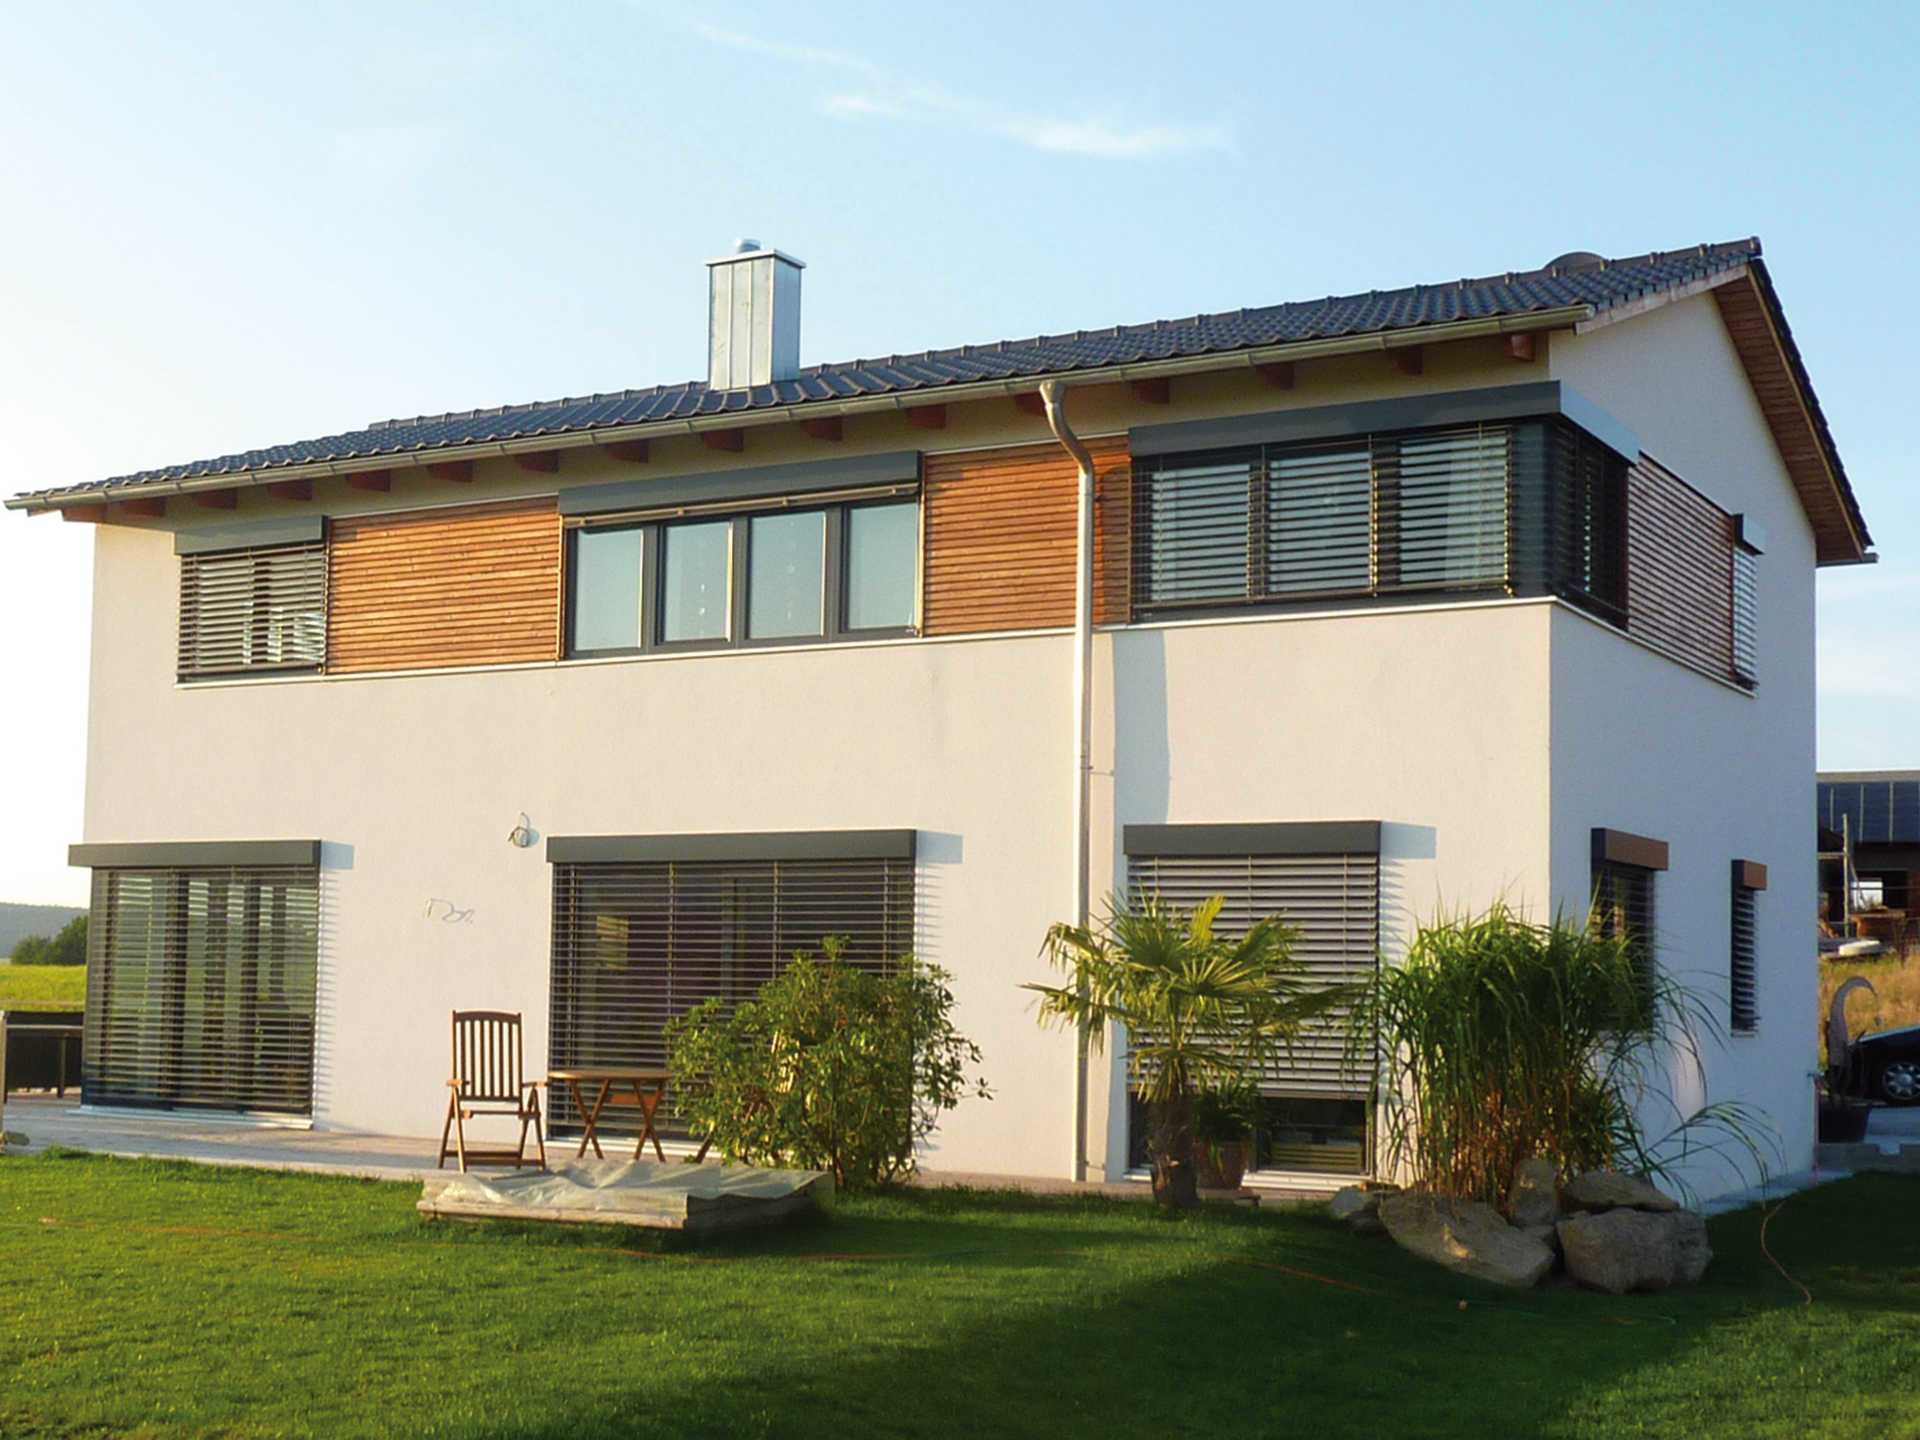 Gruber Naturholzhaus GmbH Referenzhaus 3